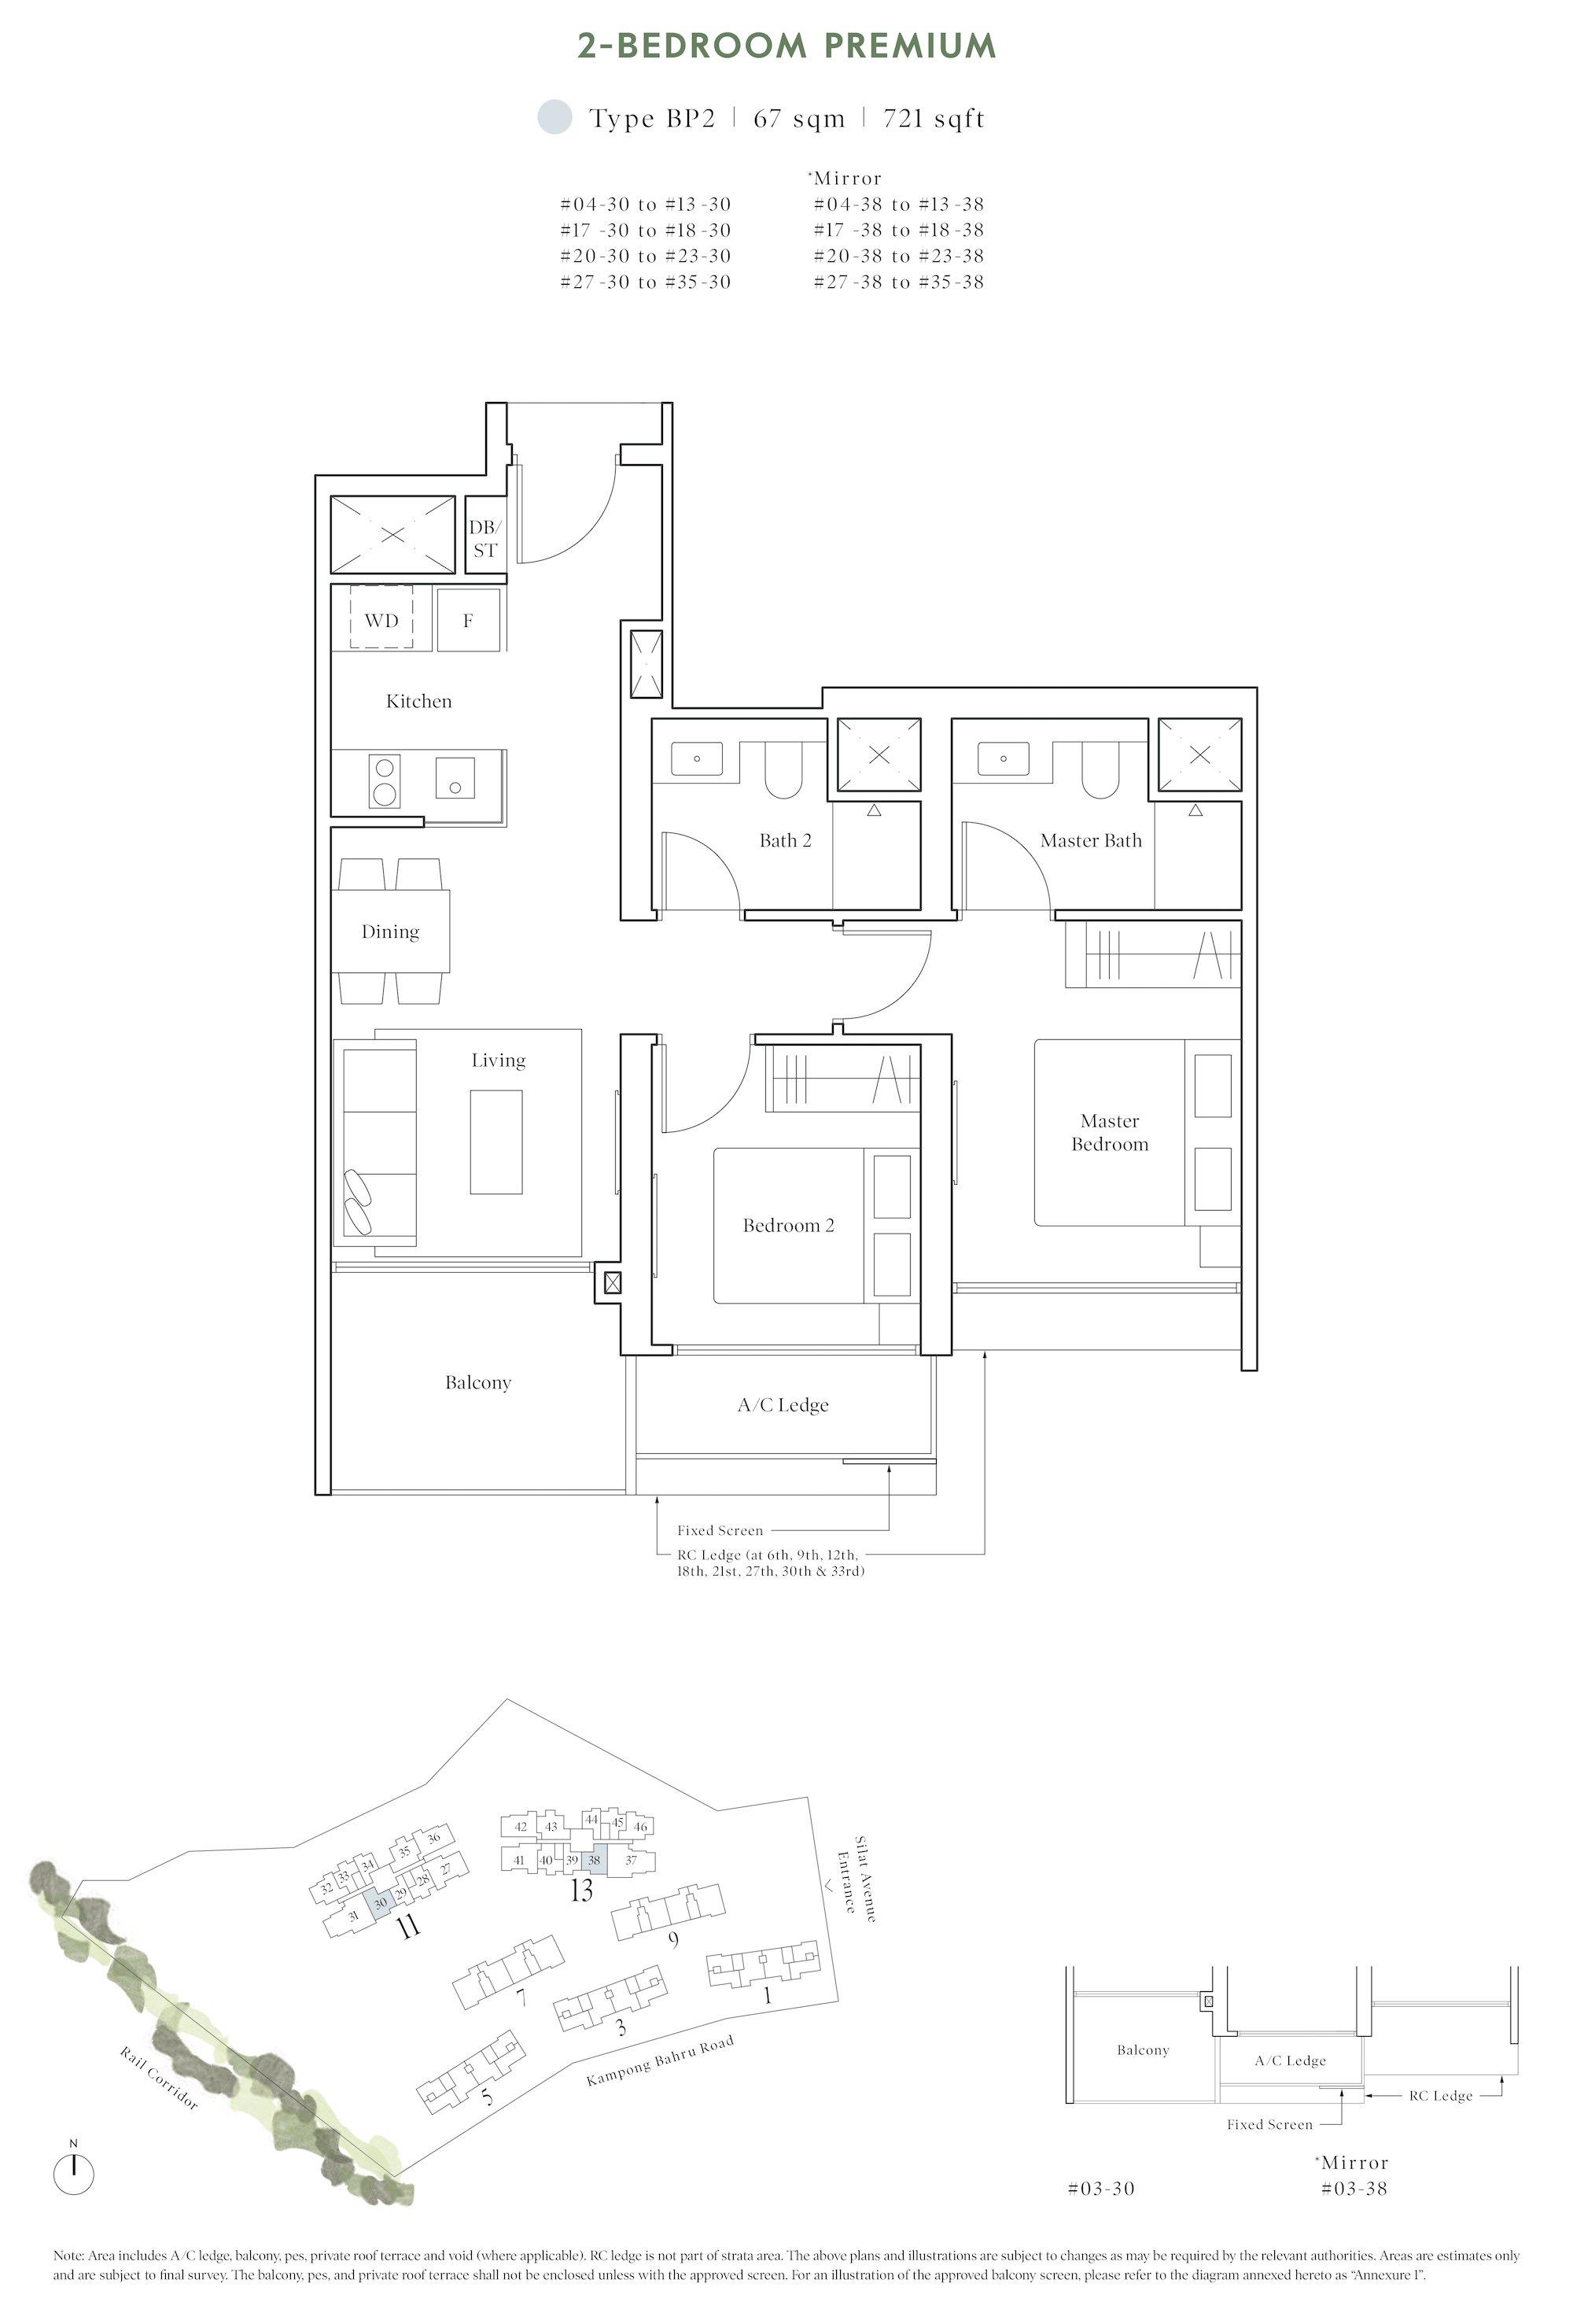 Avenue South Residence 南峰雅苑 horizon floor plan 2-bedroom bp2